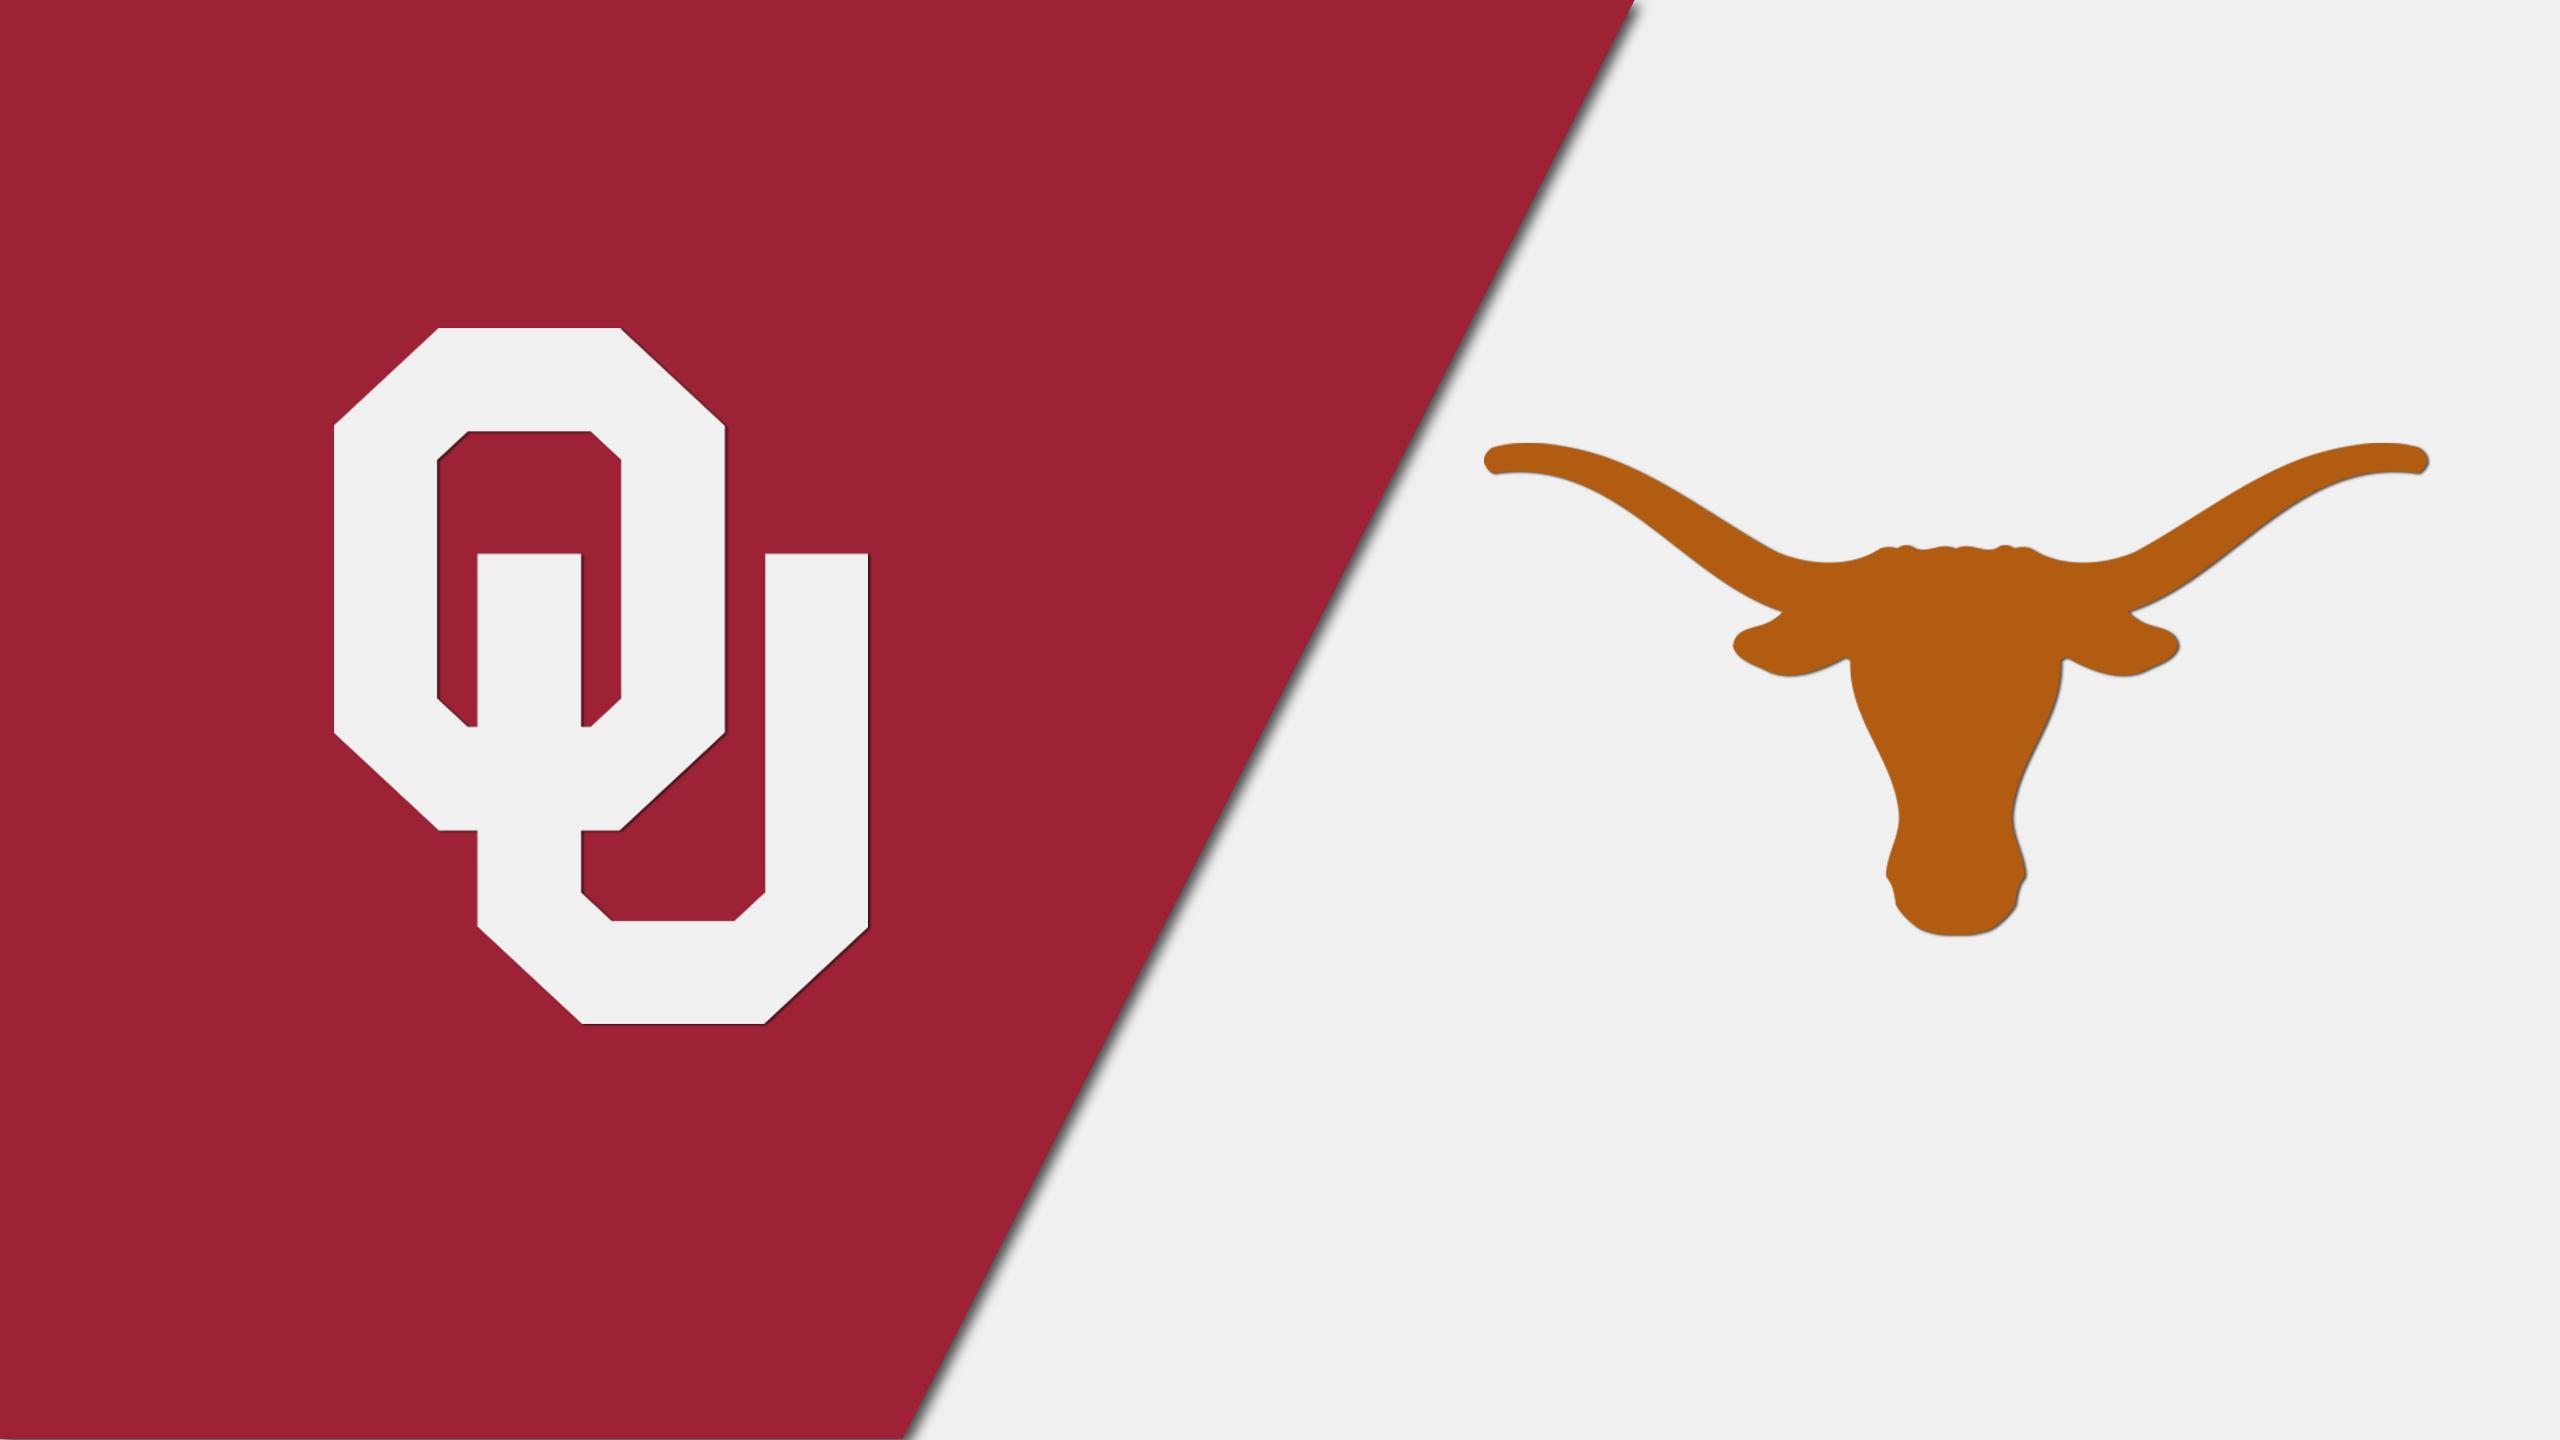 Oklahoma vs. Texas (re-air)